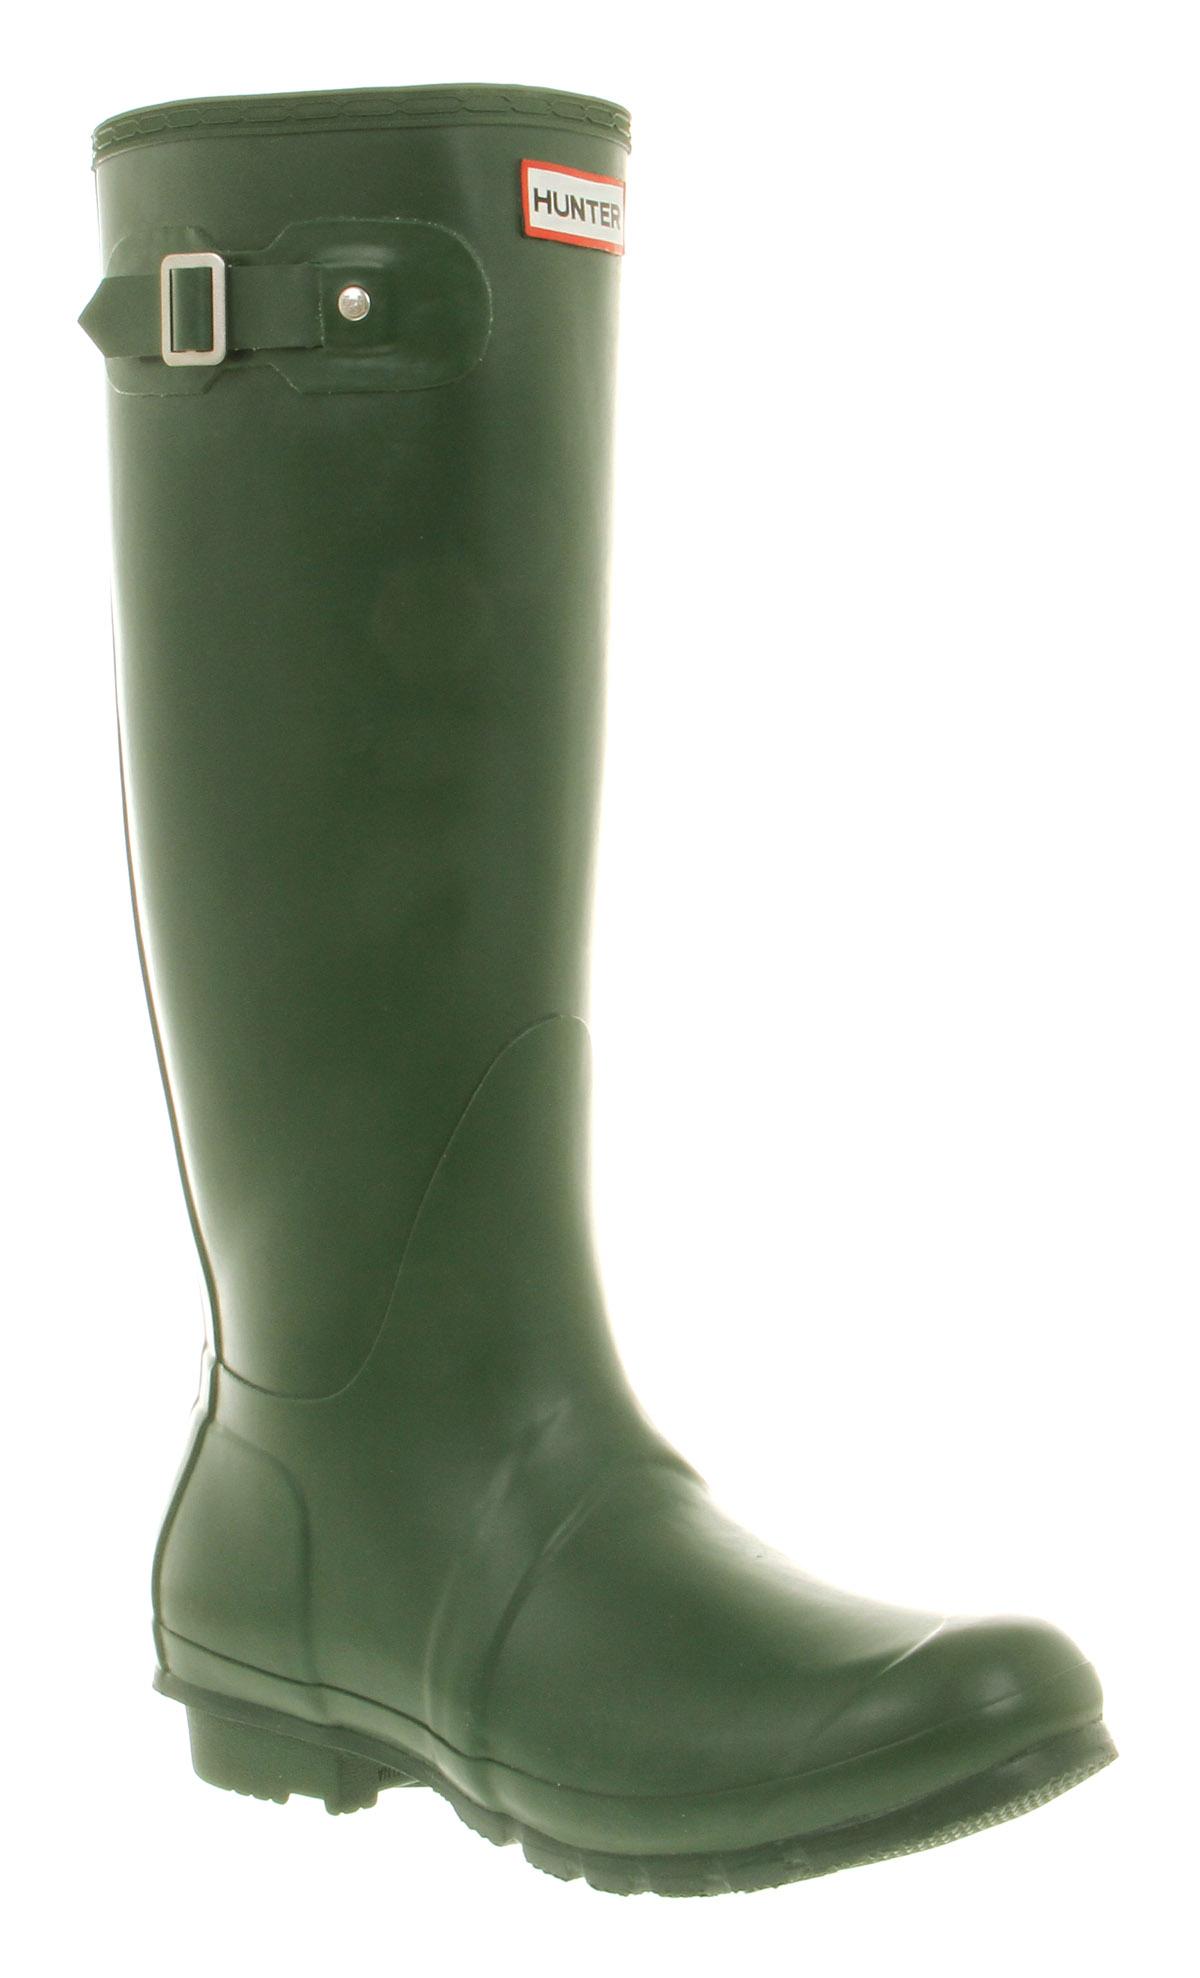 Mens Hunter Hunter Original Welly Green Rubber Boots | eBay